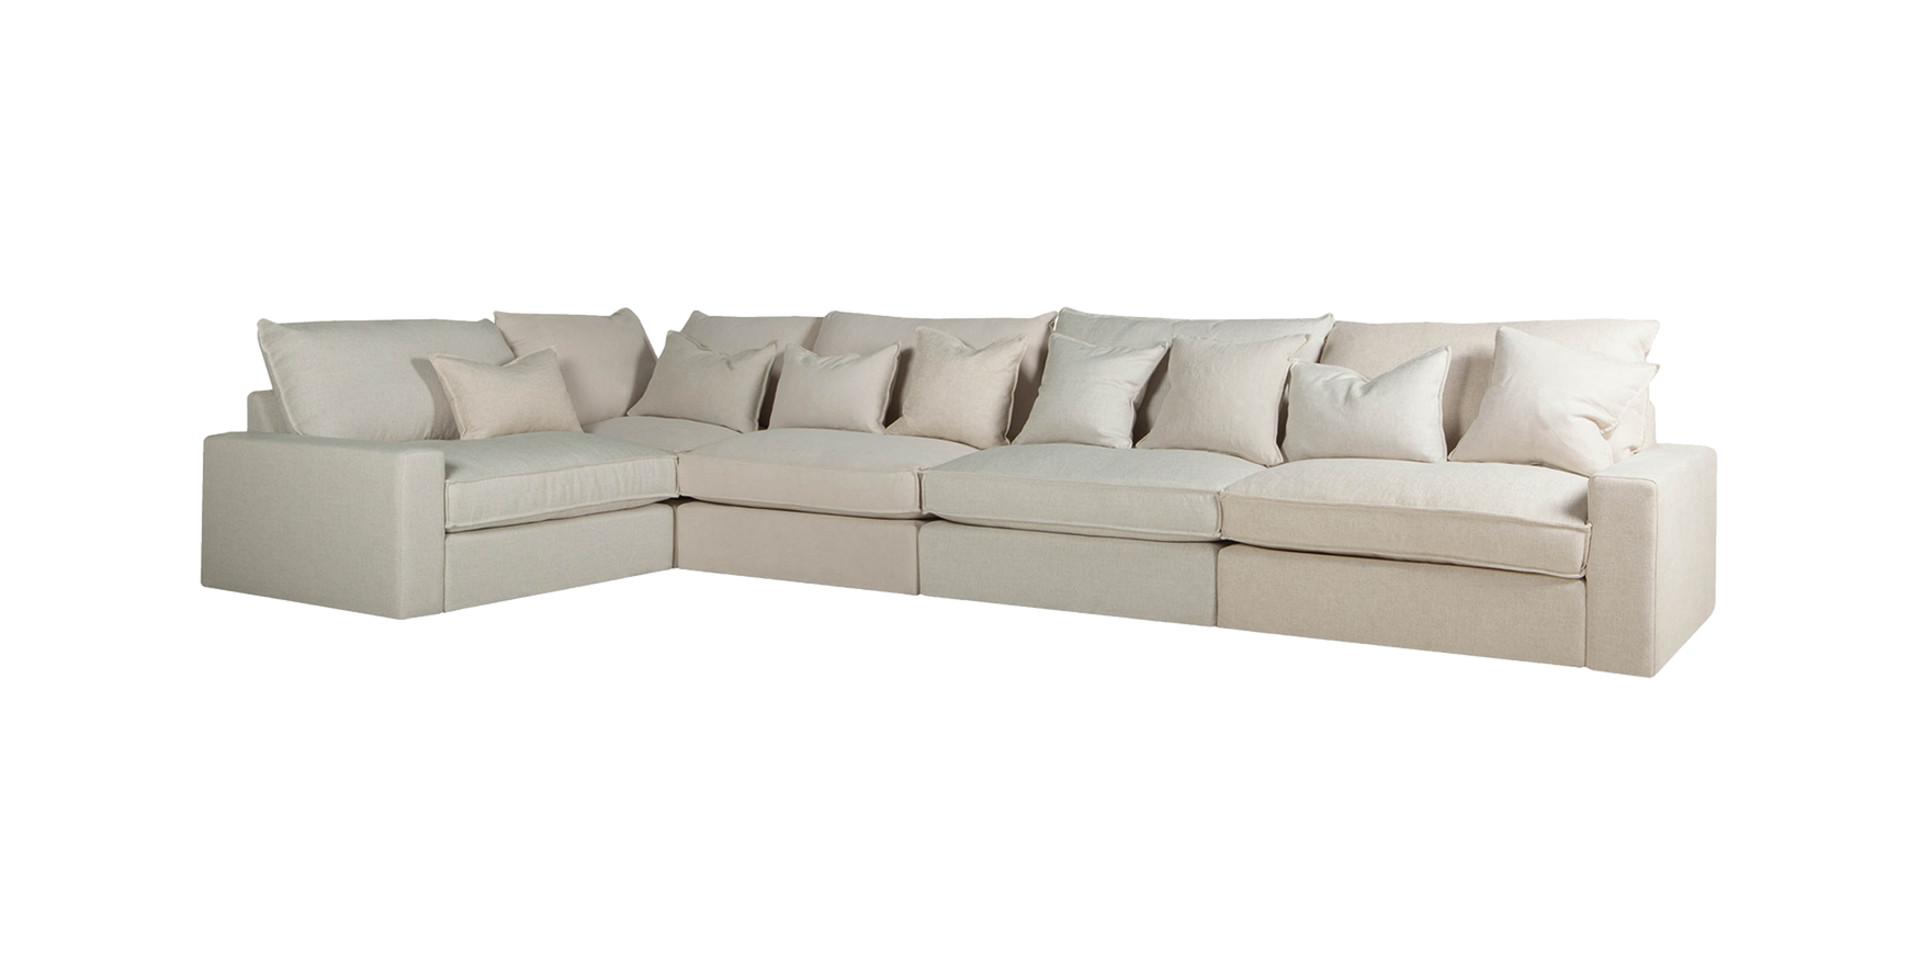 sits-oscar-angle-armchairx4_corner90_acker1_natur_nancy1_natur_caleido1419_natur_2